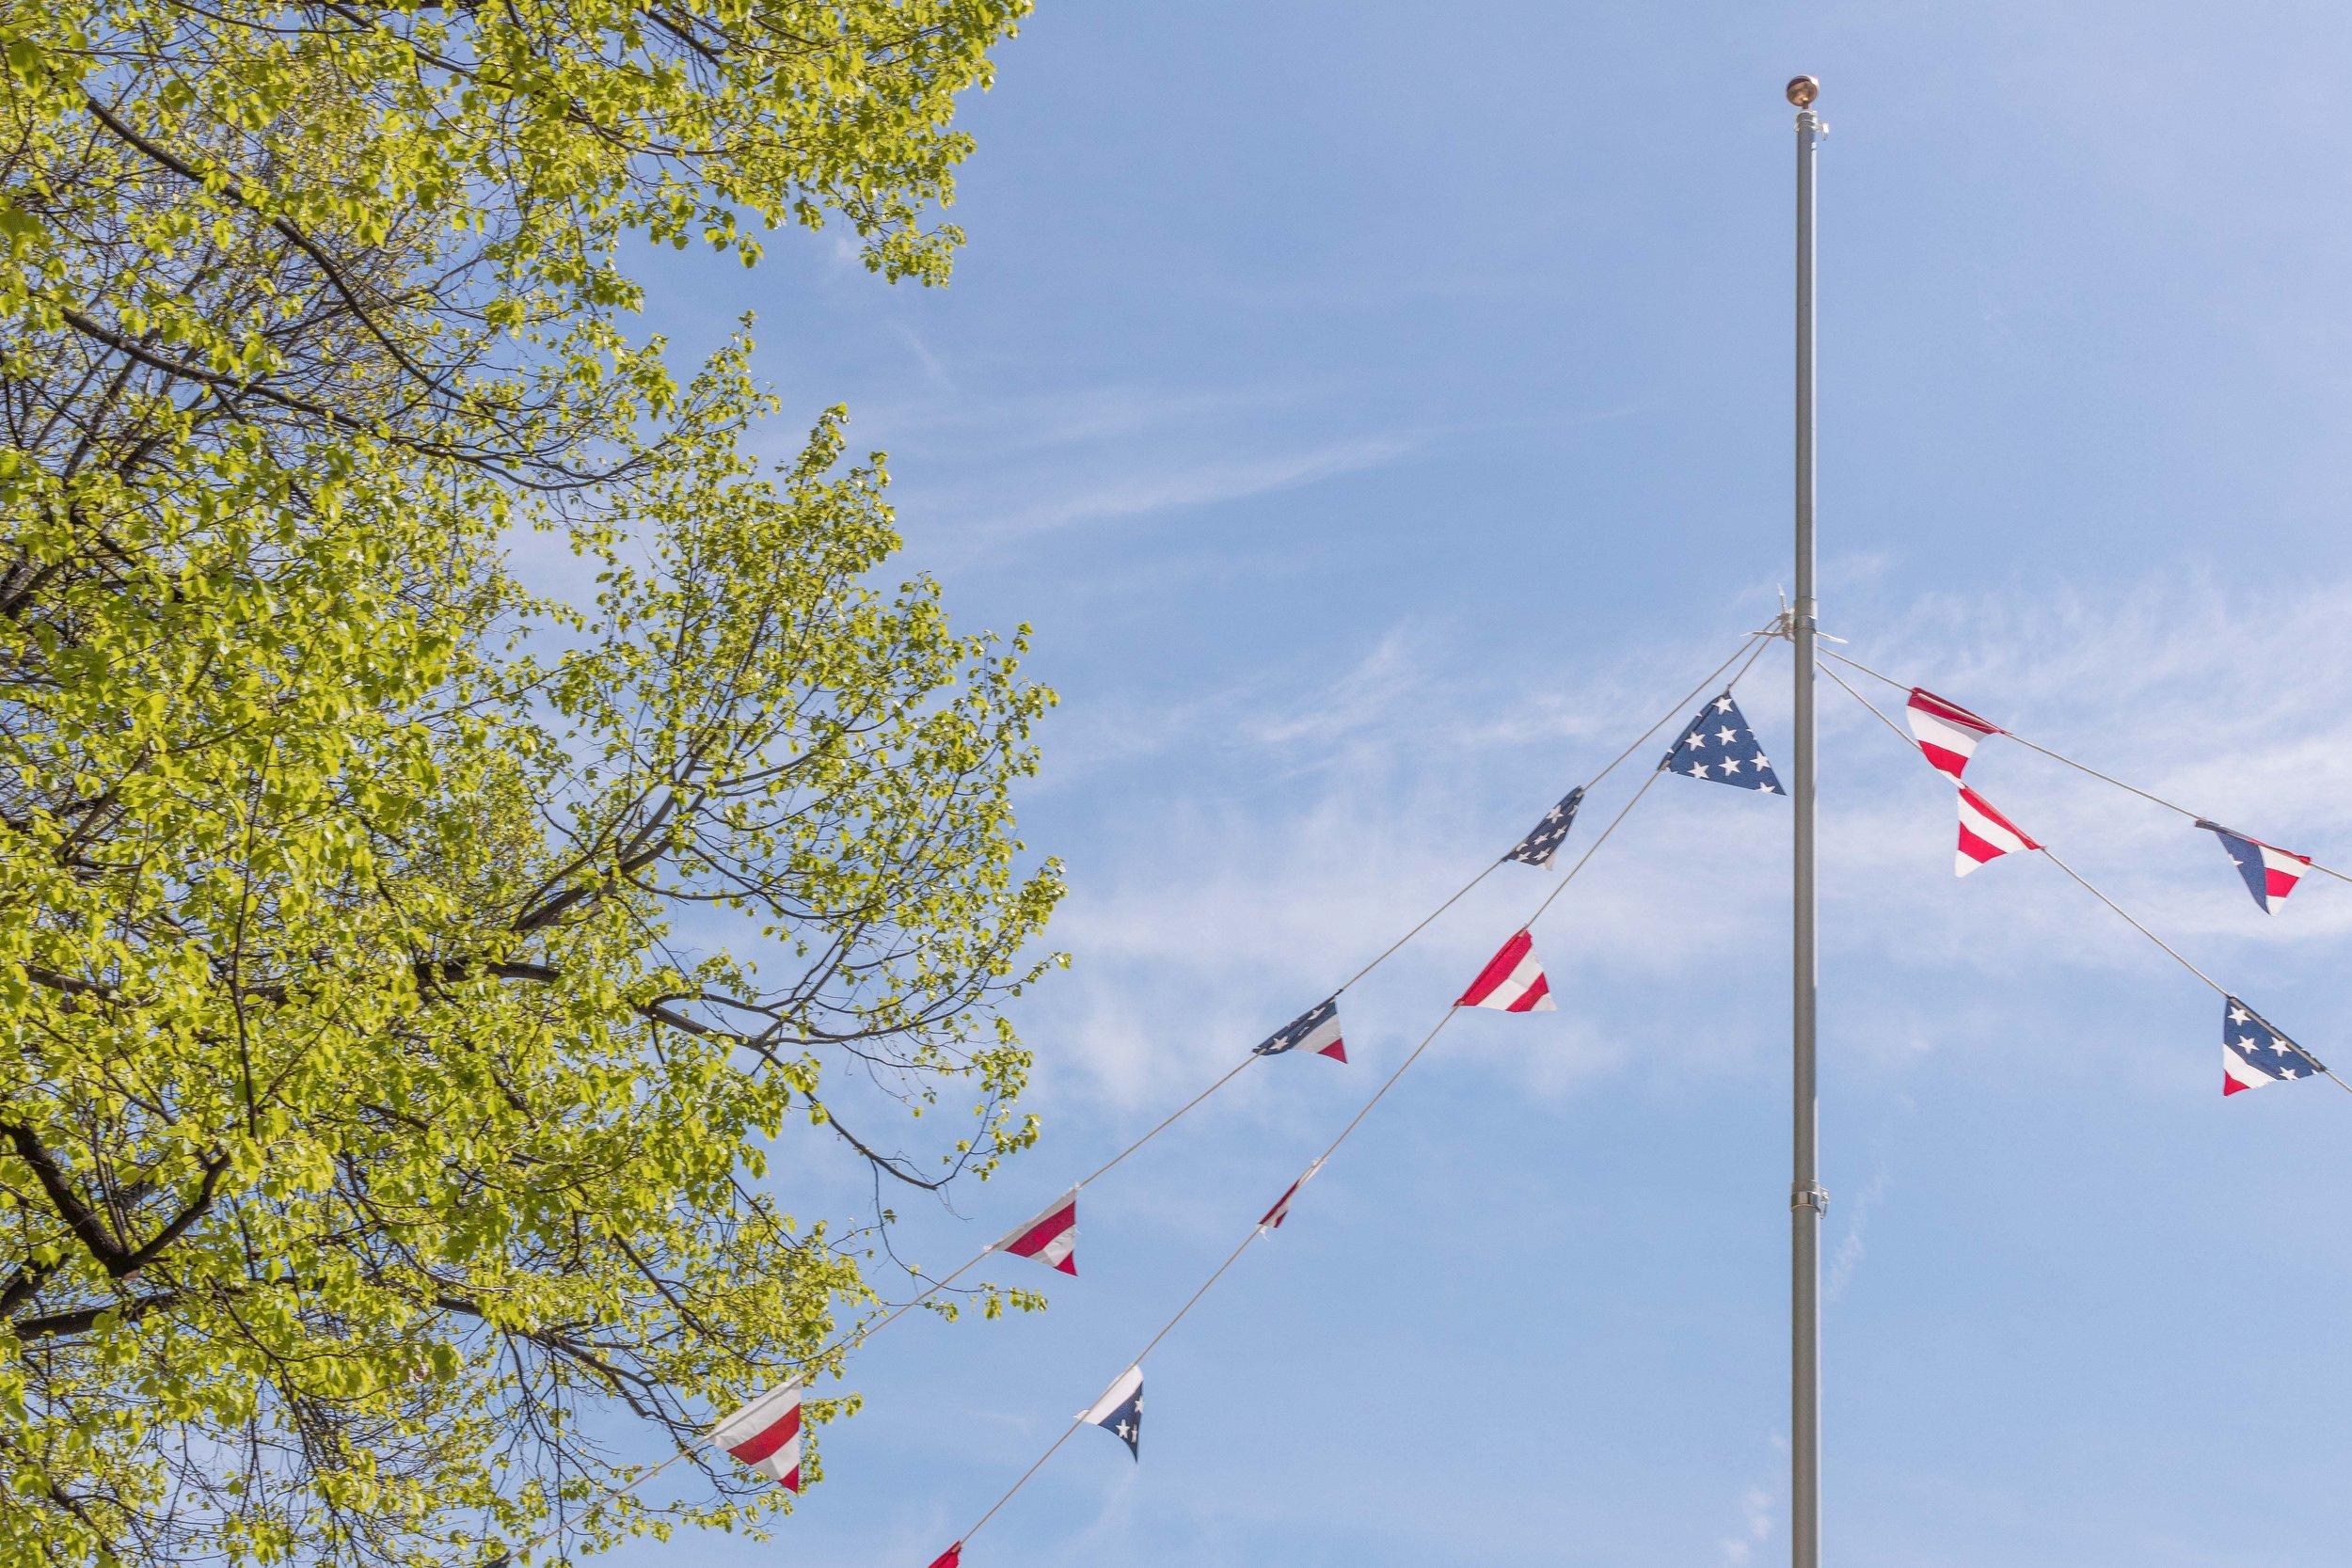 FREE, 2019  U.S. flags, wood, paint, rope, flag pole